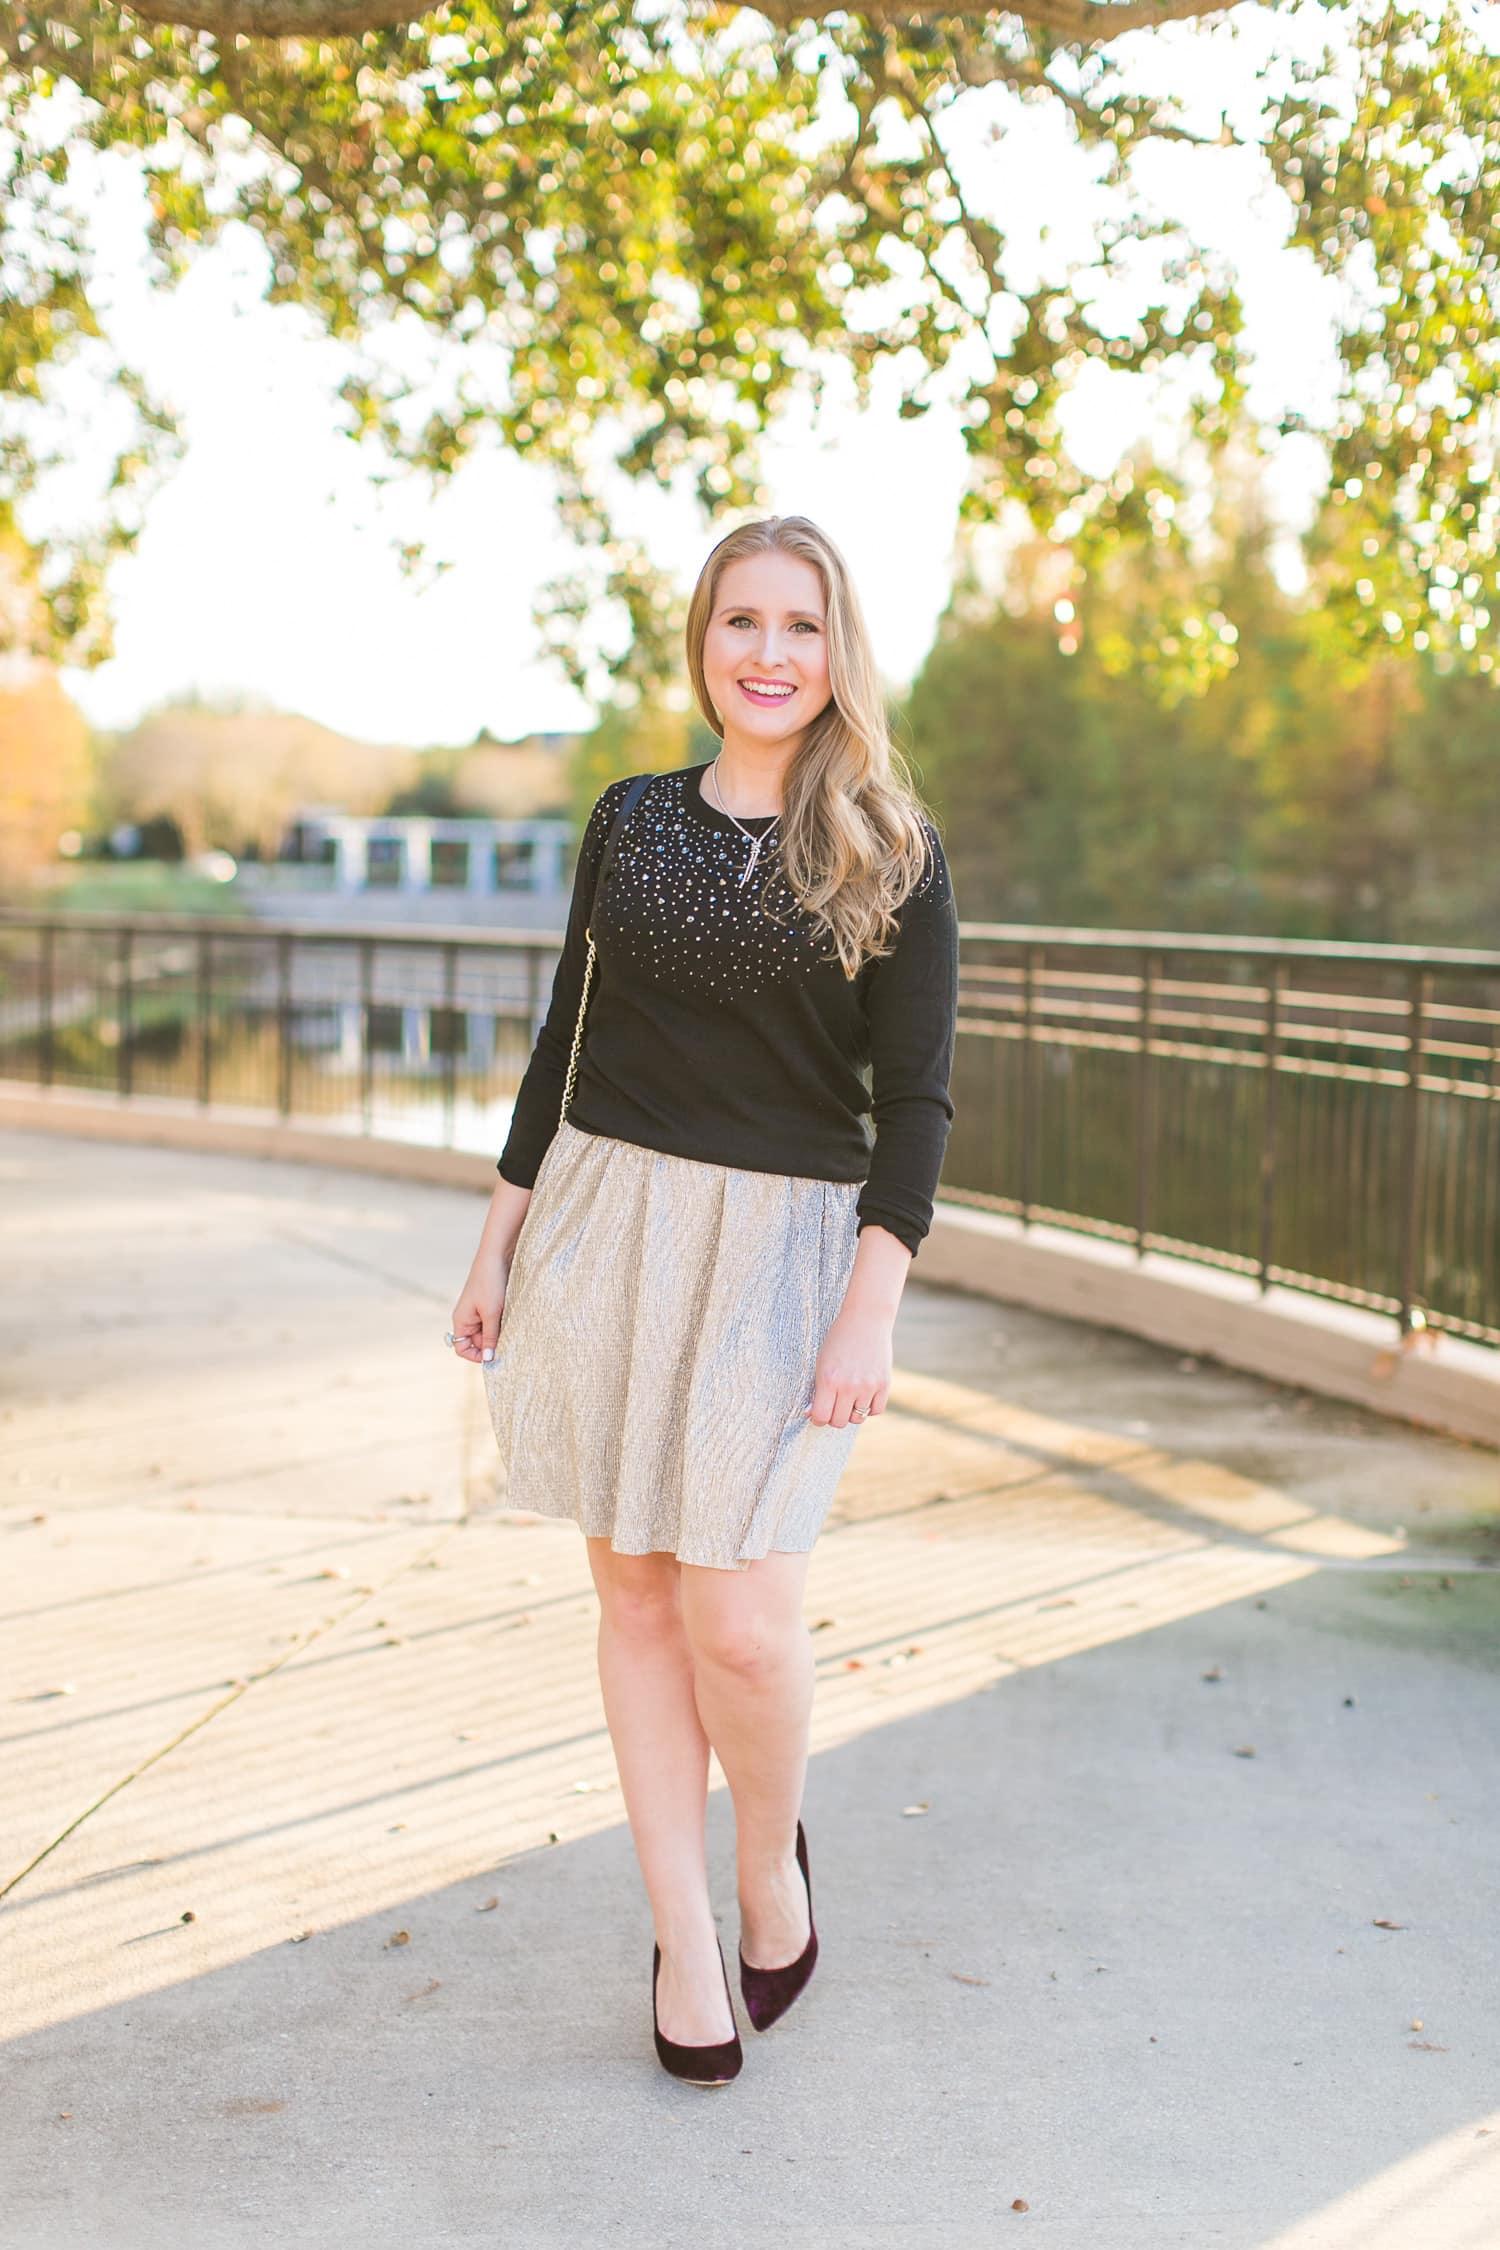 sunset golden hour date outfit ideas beauty blogger posing in park glitter skirt black top